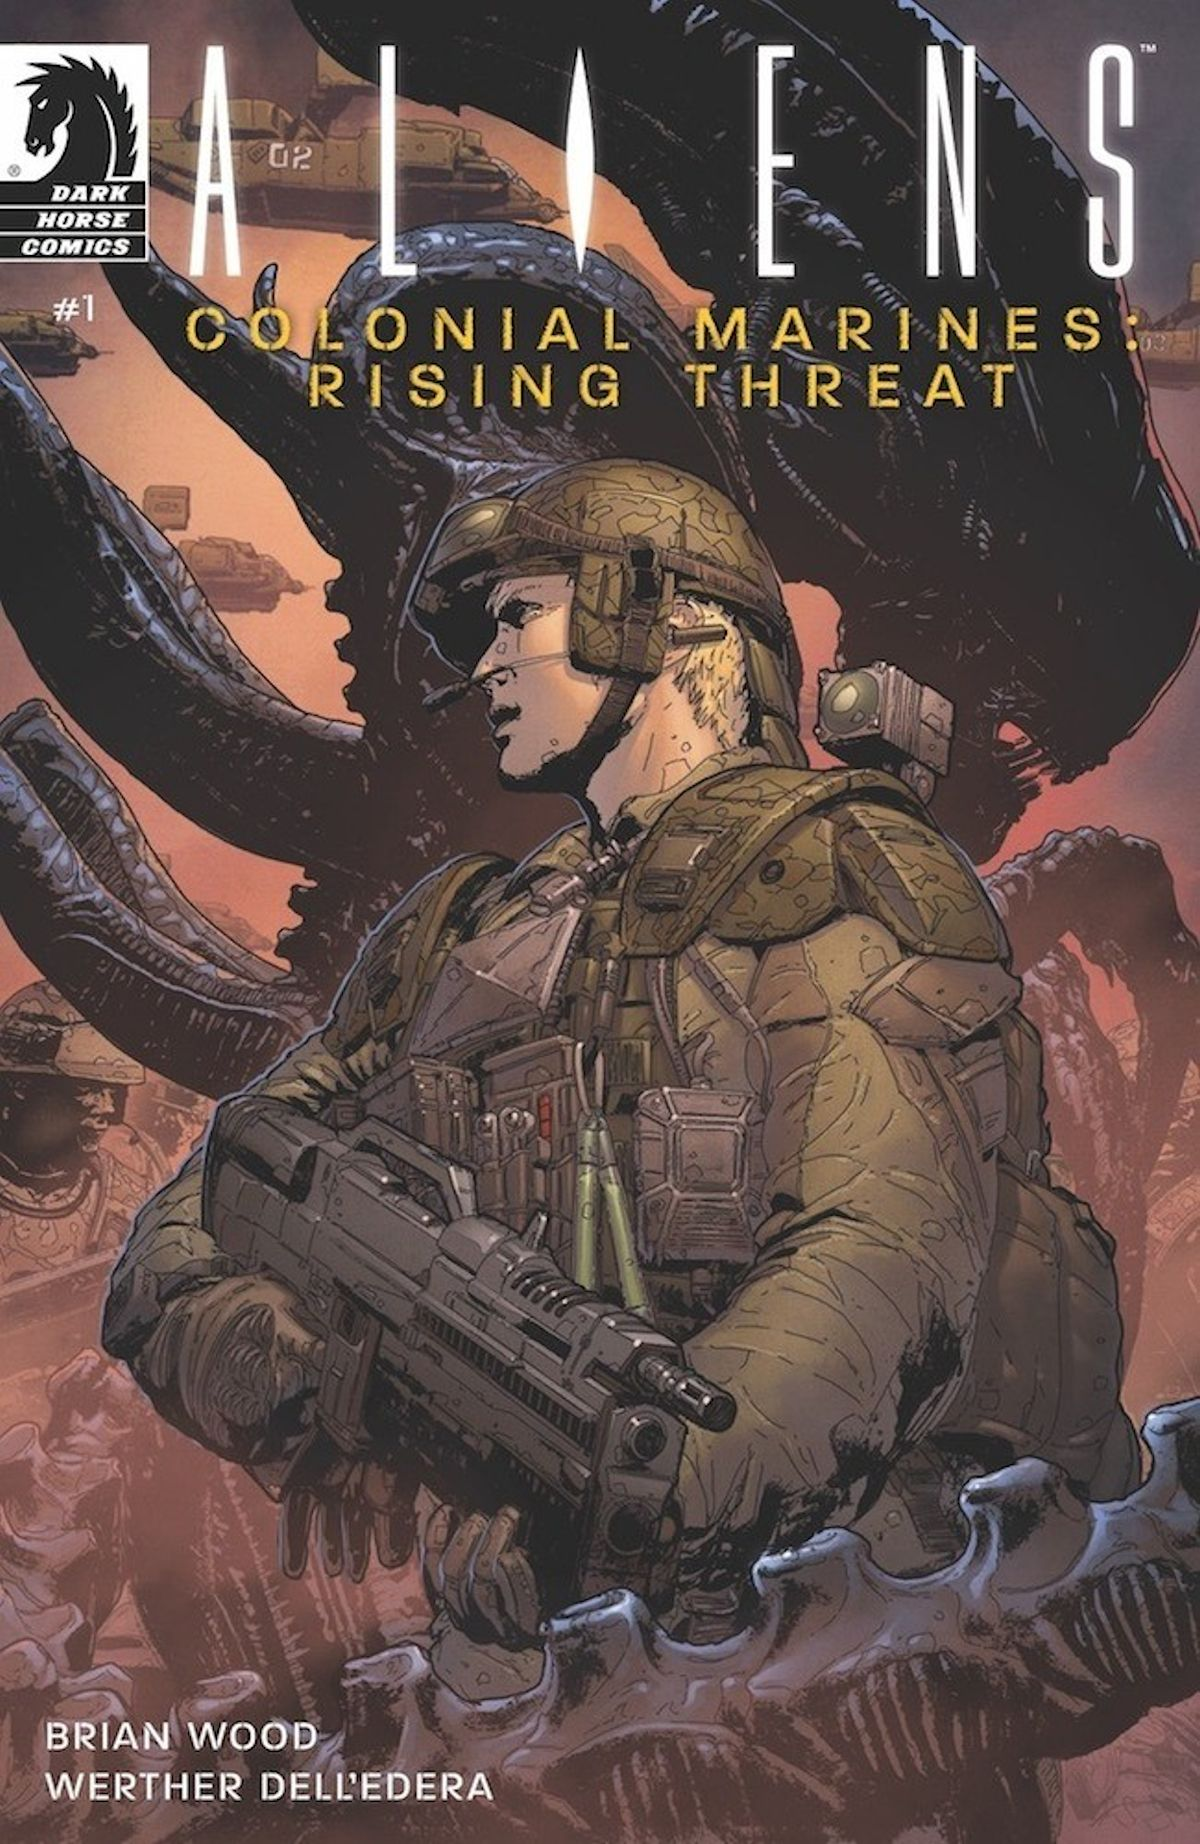 Aliens Colonial Marines: Rising Threat